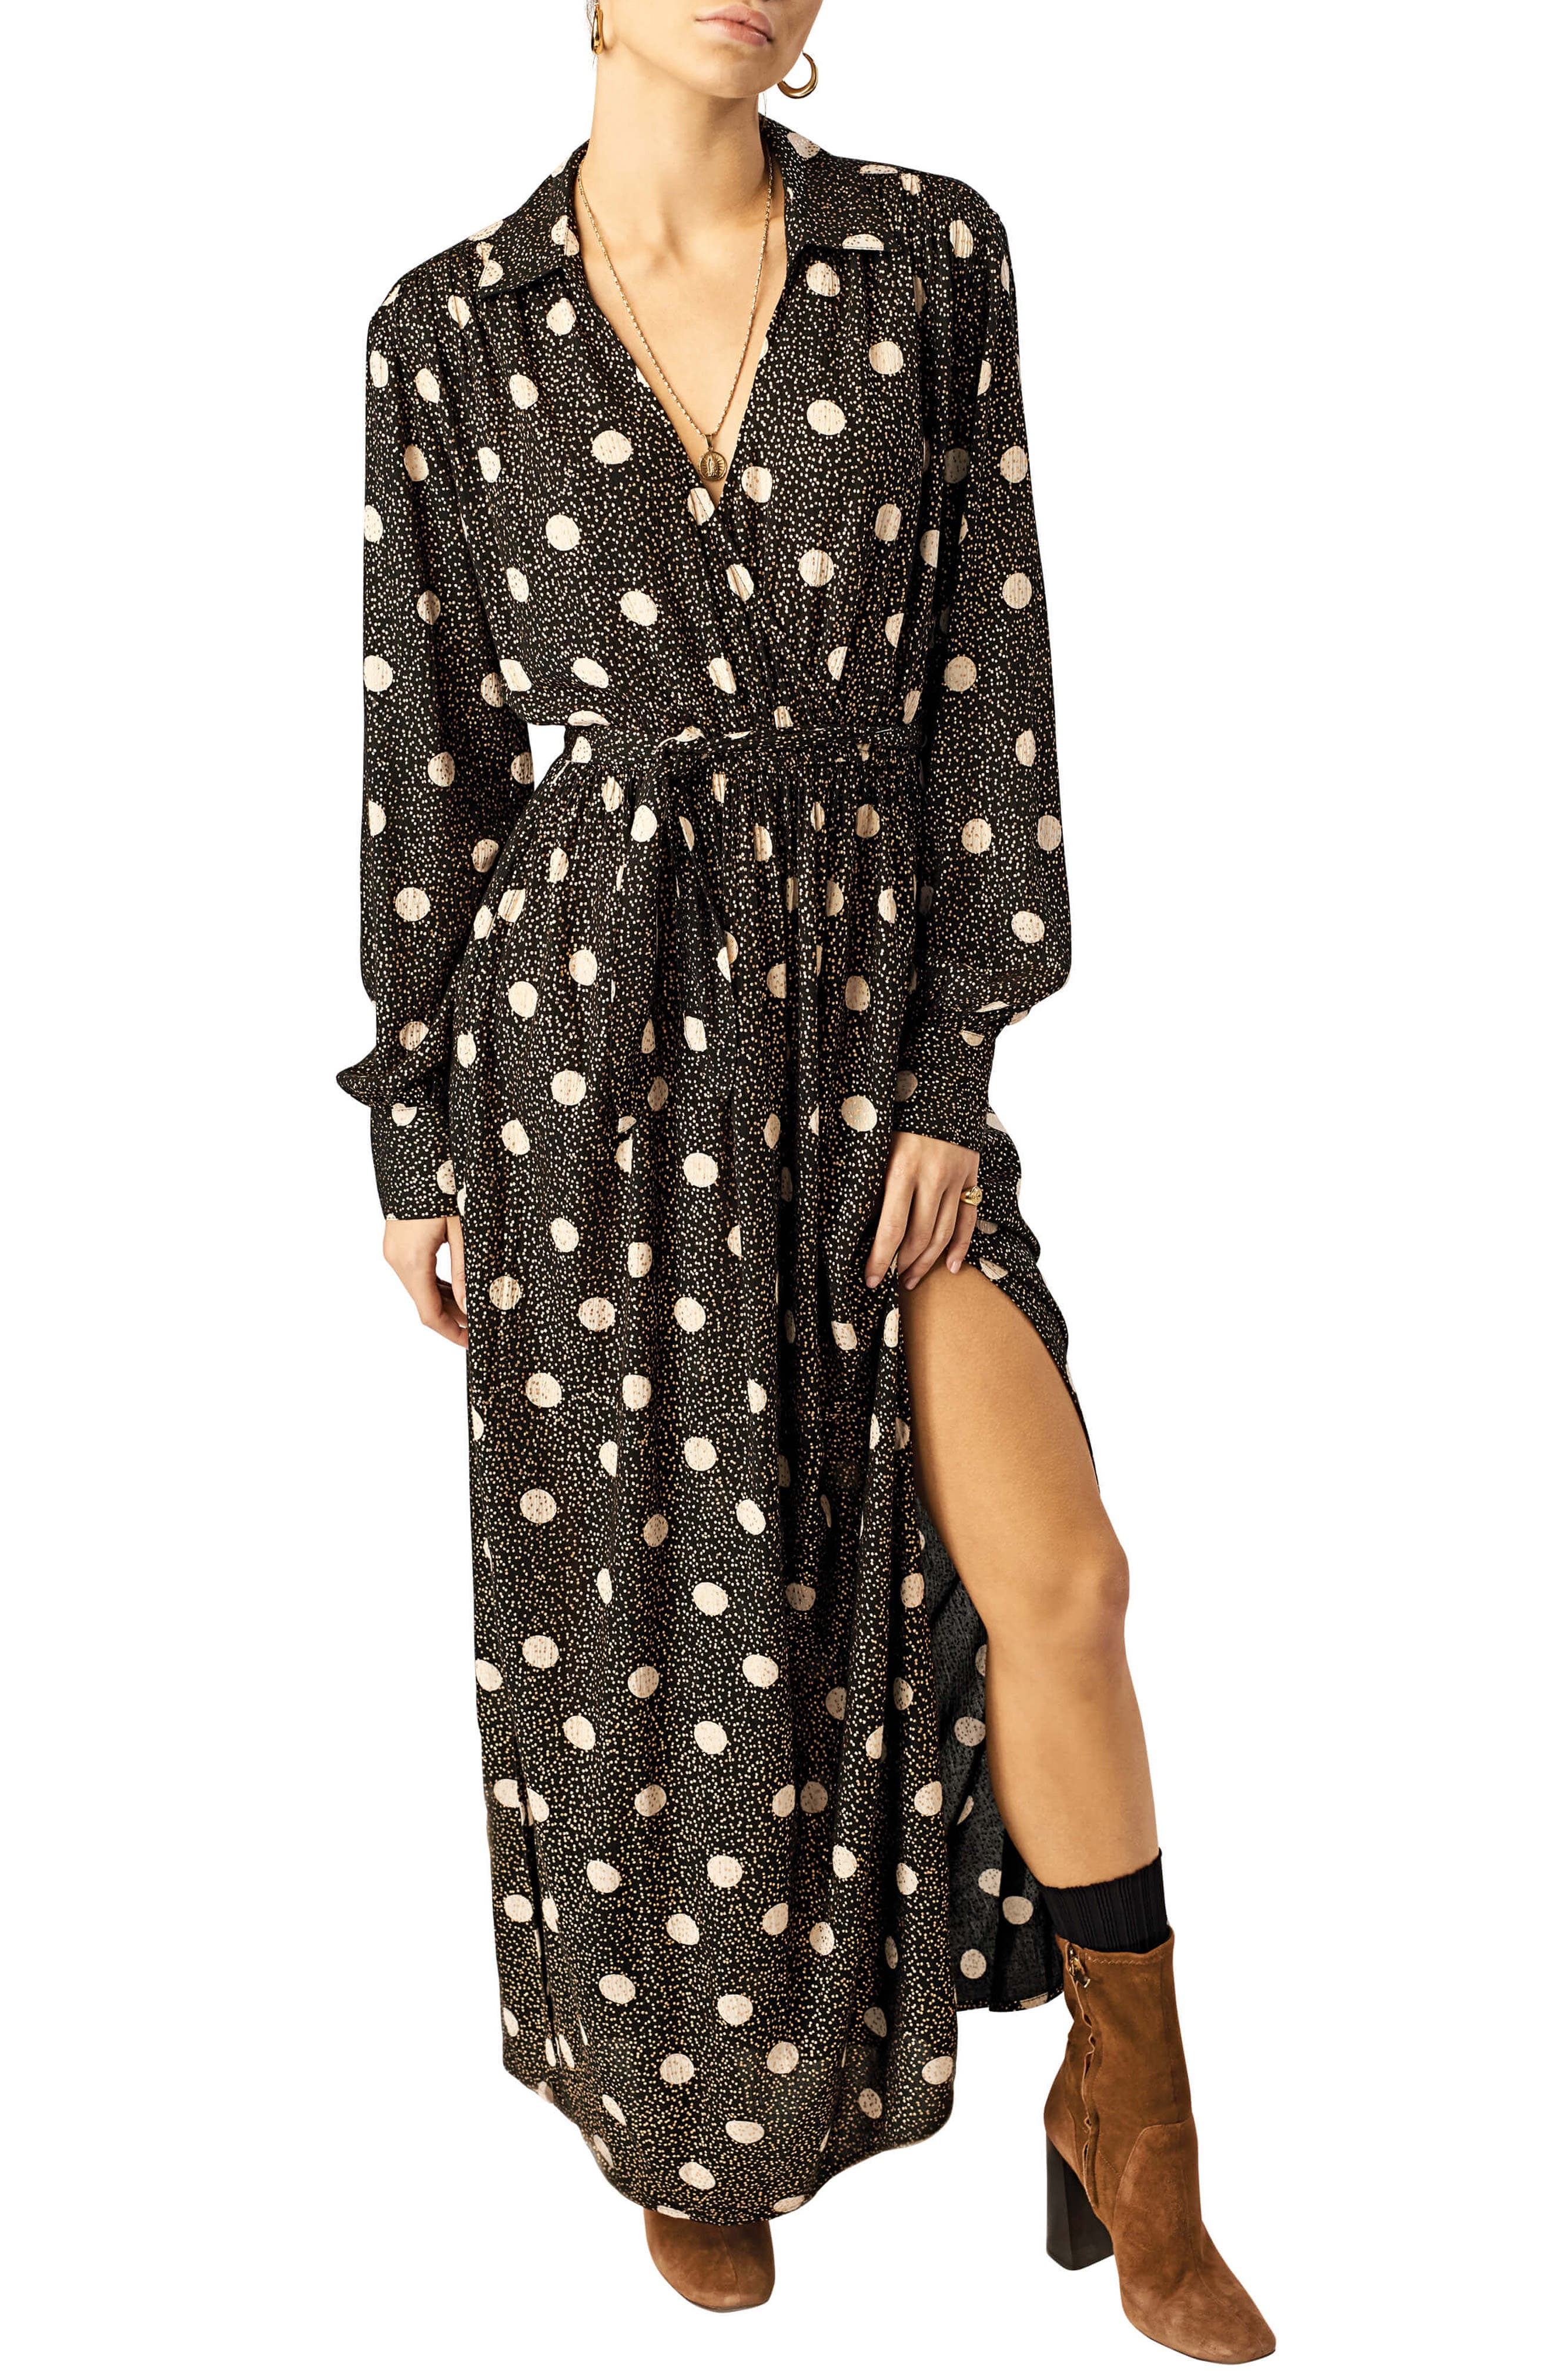 STONE ROW Smoka Dot Surplice Maxi Dress, Main, color, BLACK COMBO